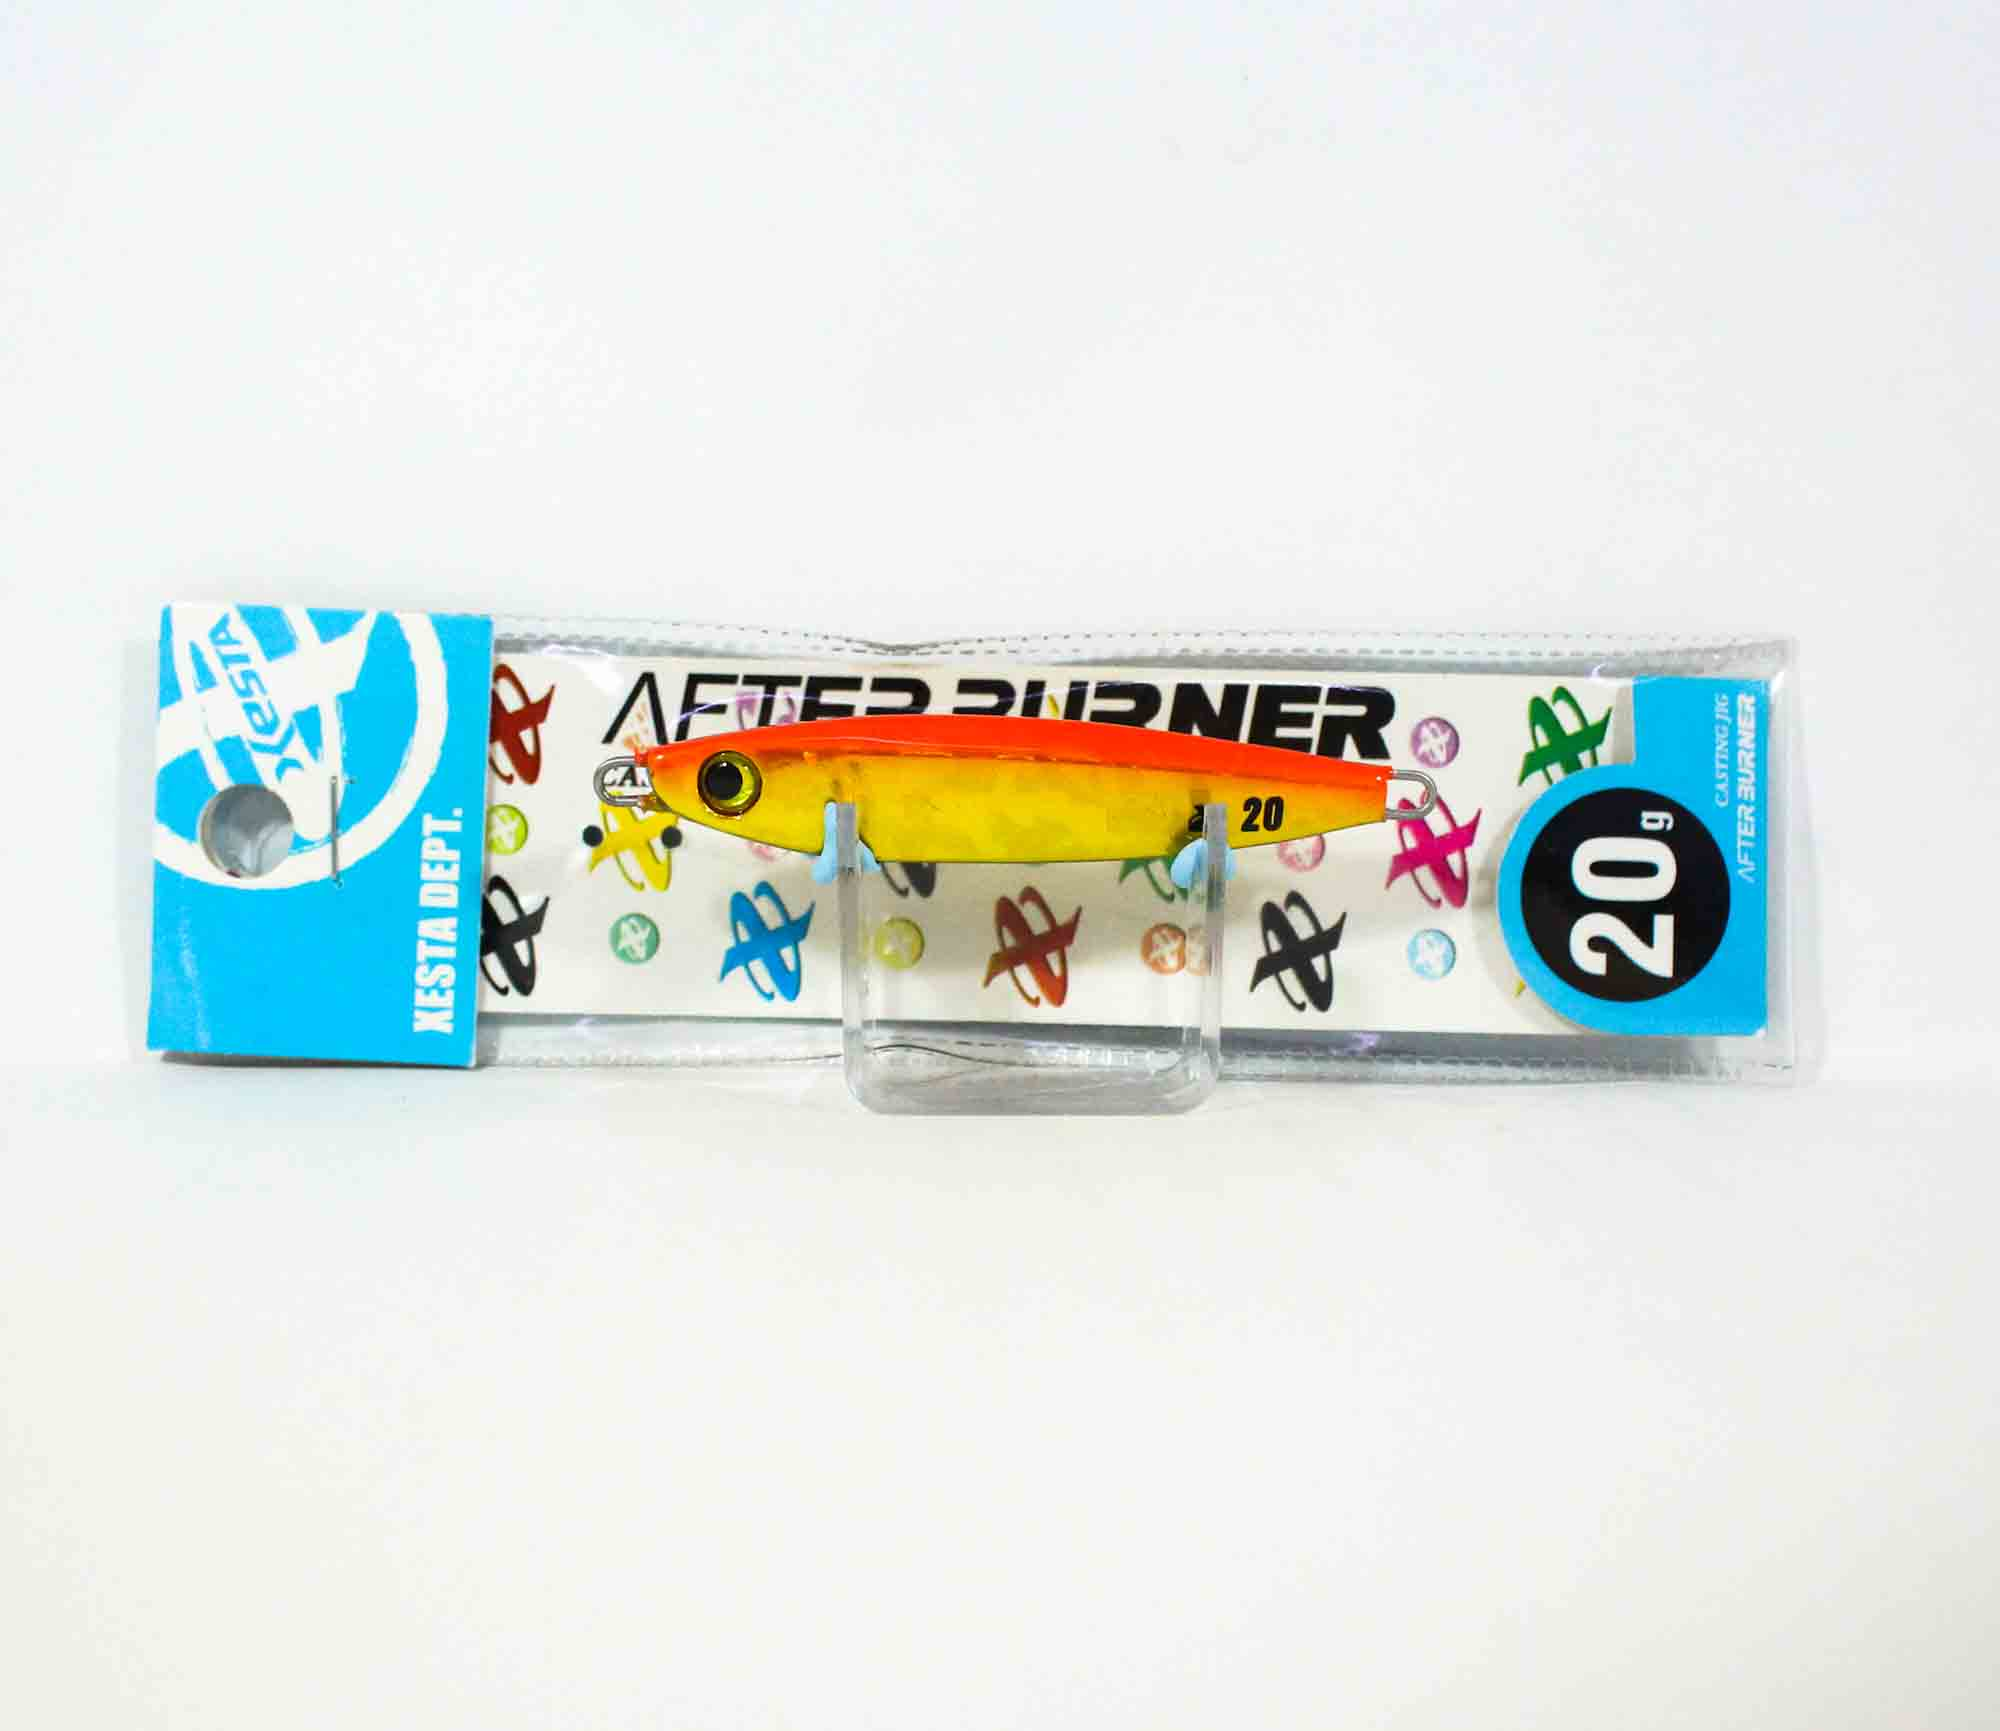 Sale Xesta Metal Jig After Burner 20 grams OGD (8569)